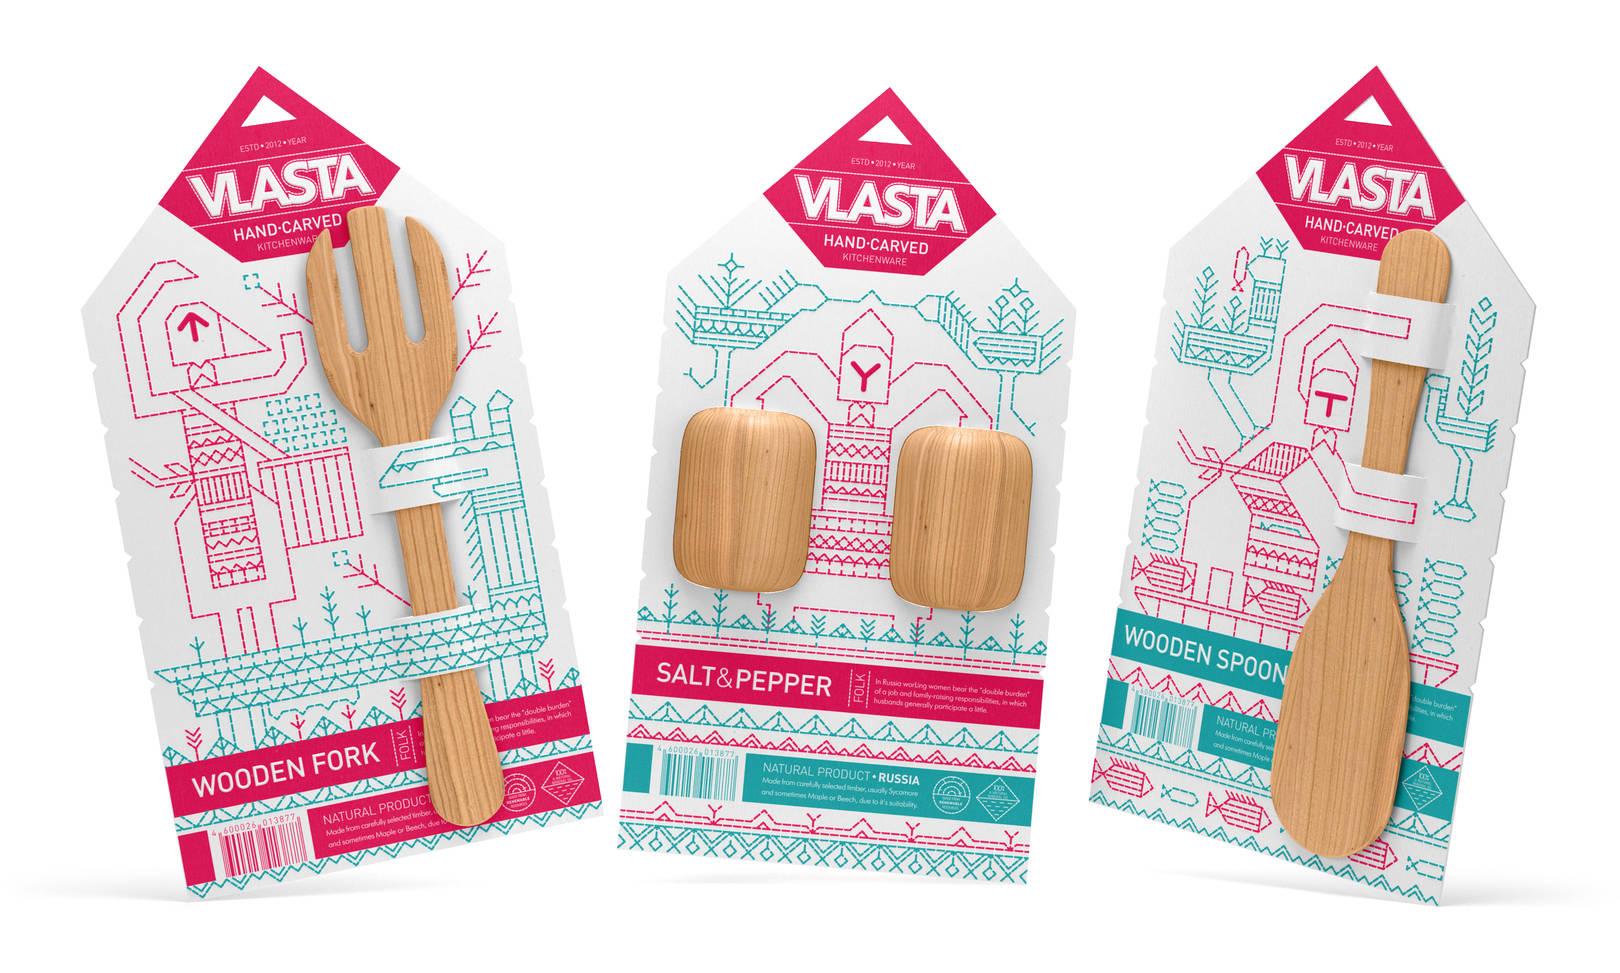 Кухонная утварь «Vlasta»